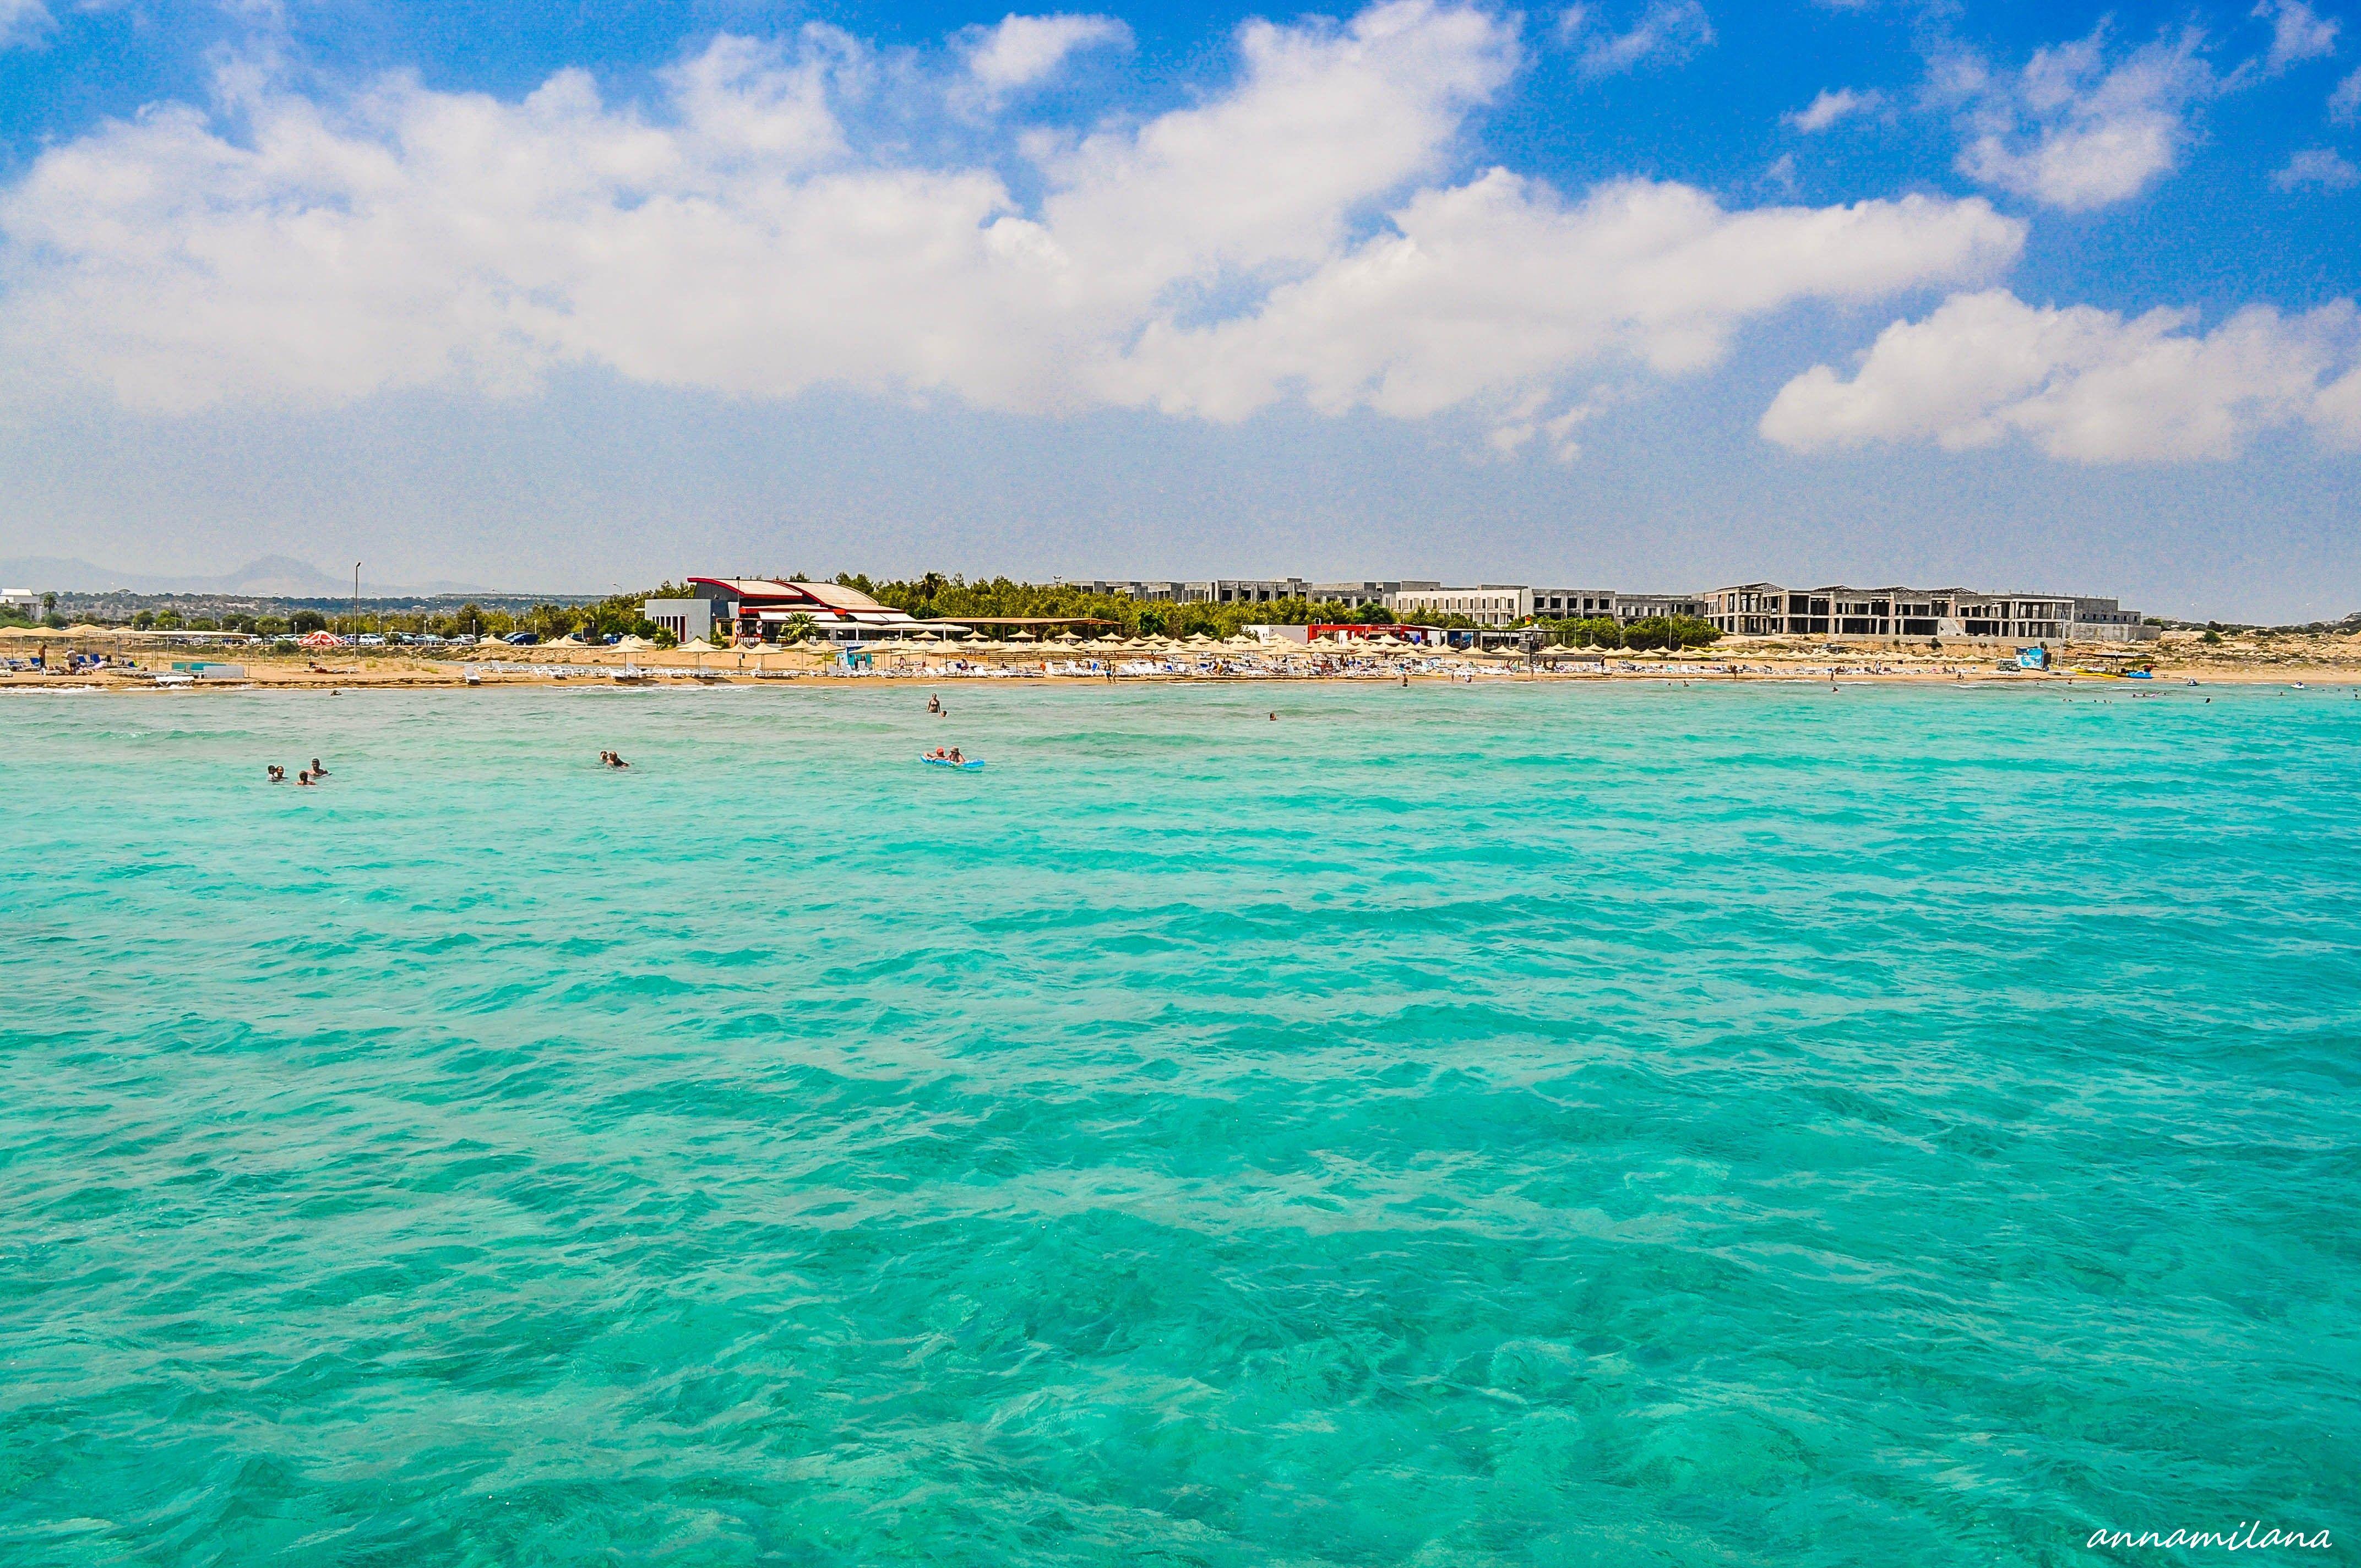 Море Кипра пригодно для купания